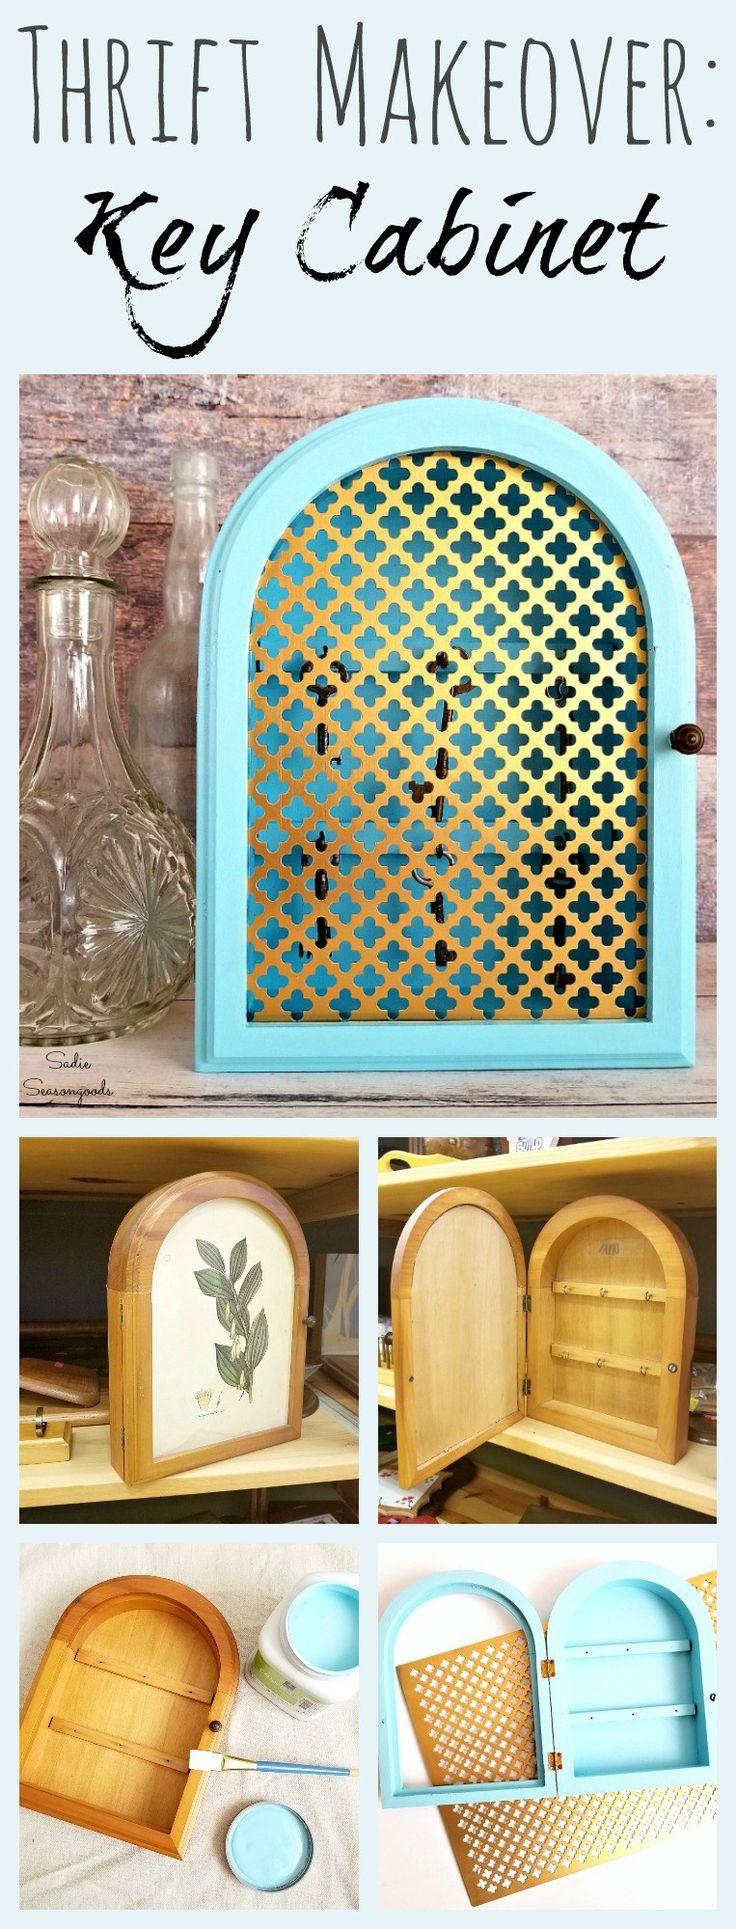 How to transform a Vintage Key Hook Cabinet with paint and decorative metal sheet insert by Sadie Seasongoods / www.sadieseasongoods.com